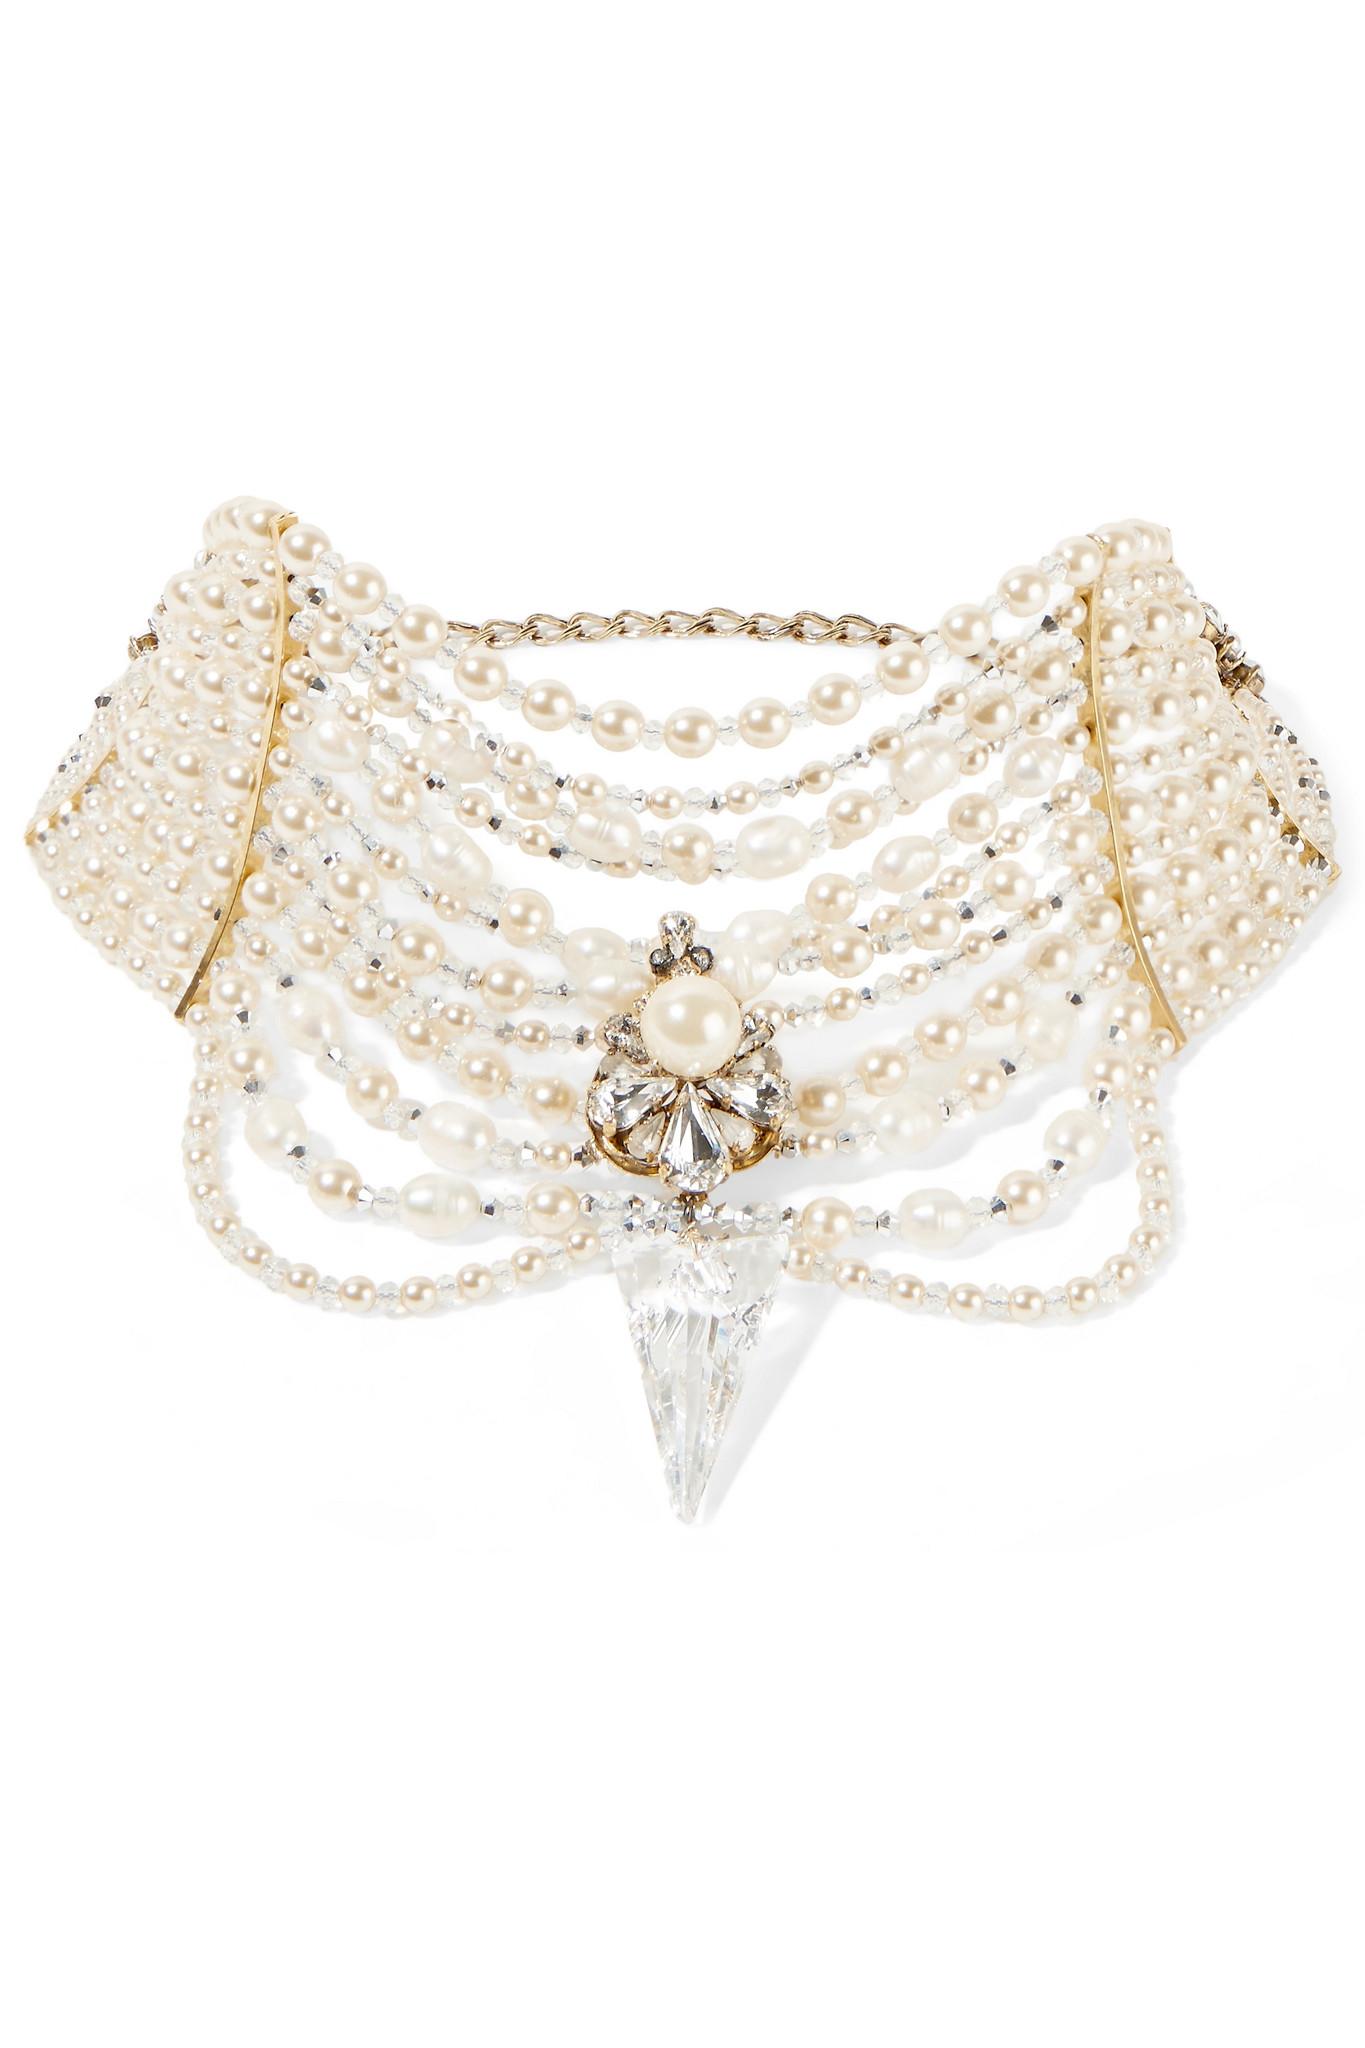 Erickson Beamon Born Again Gold-plated, Swarovski Crystal And Faux Pearl Choker - Ivory